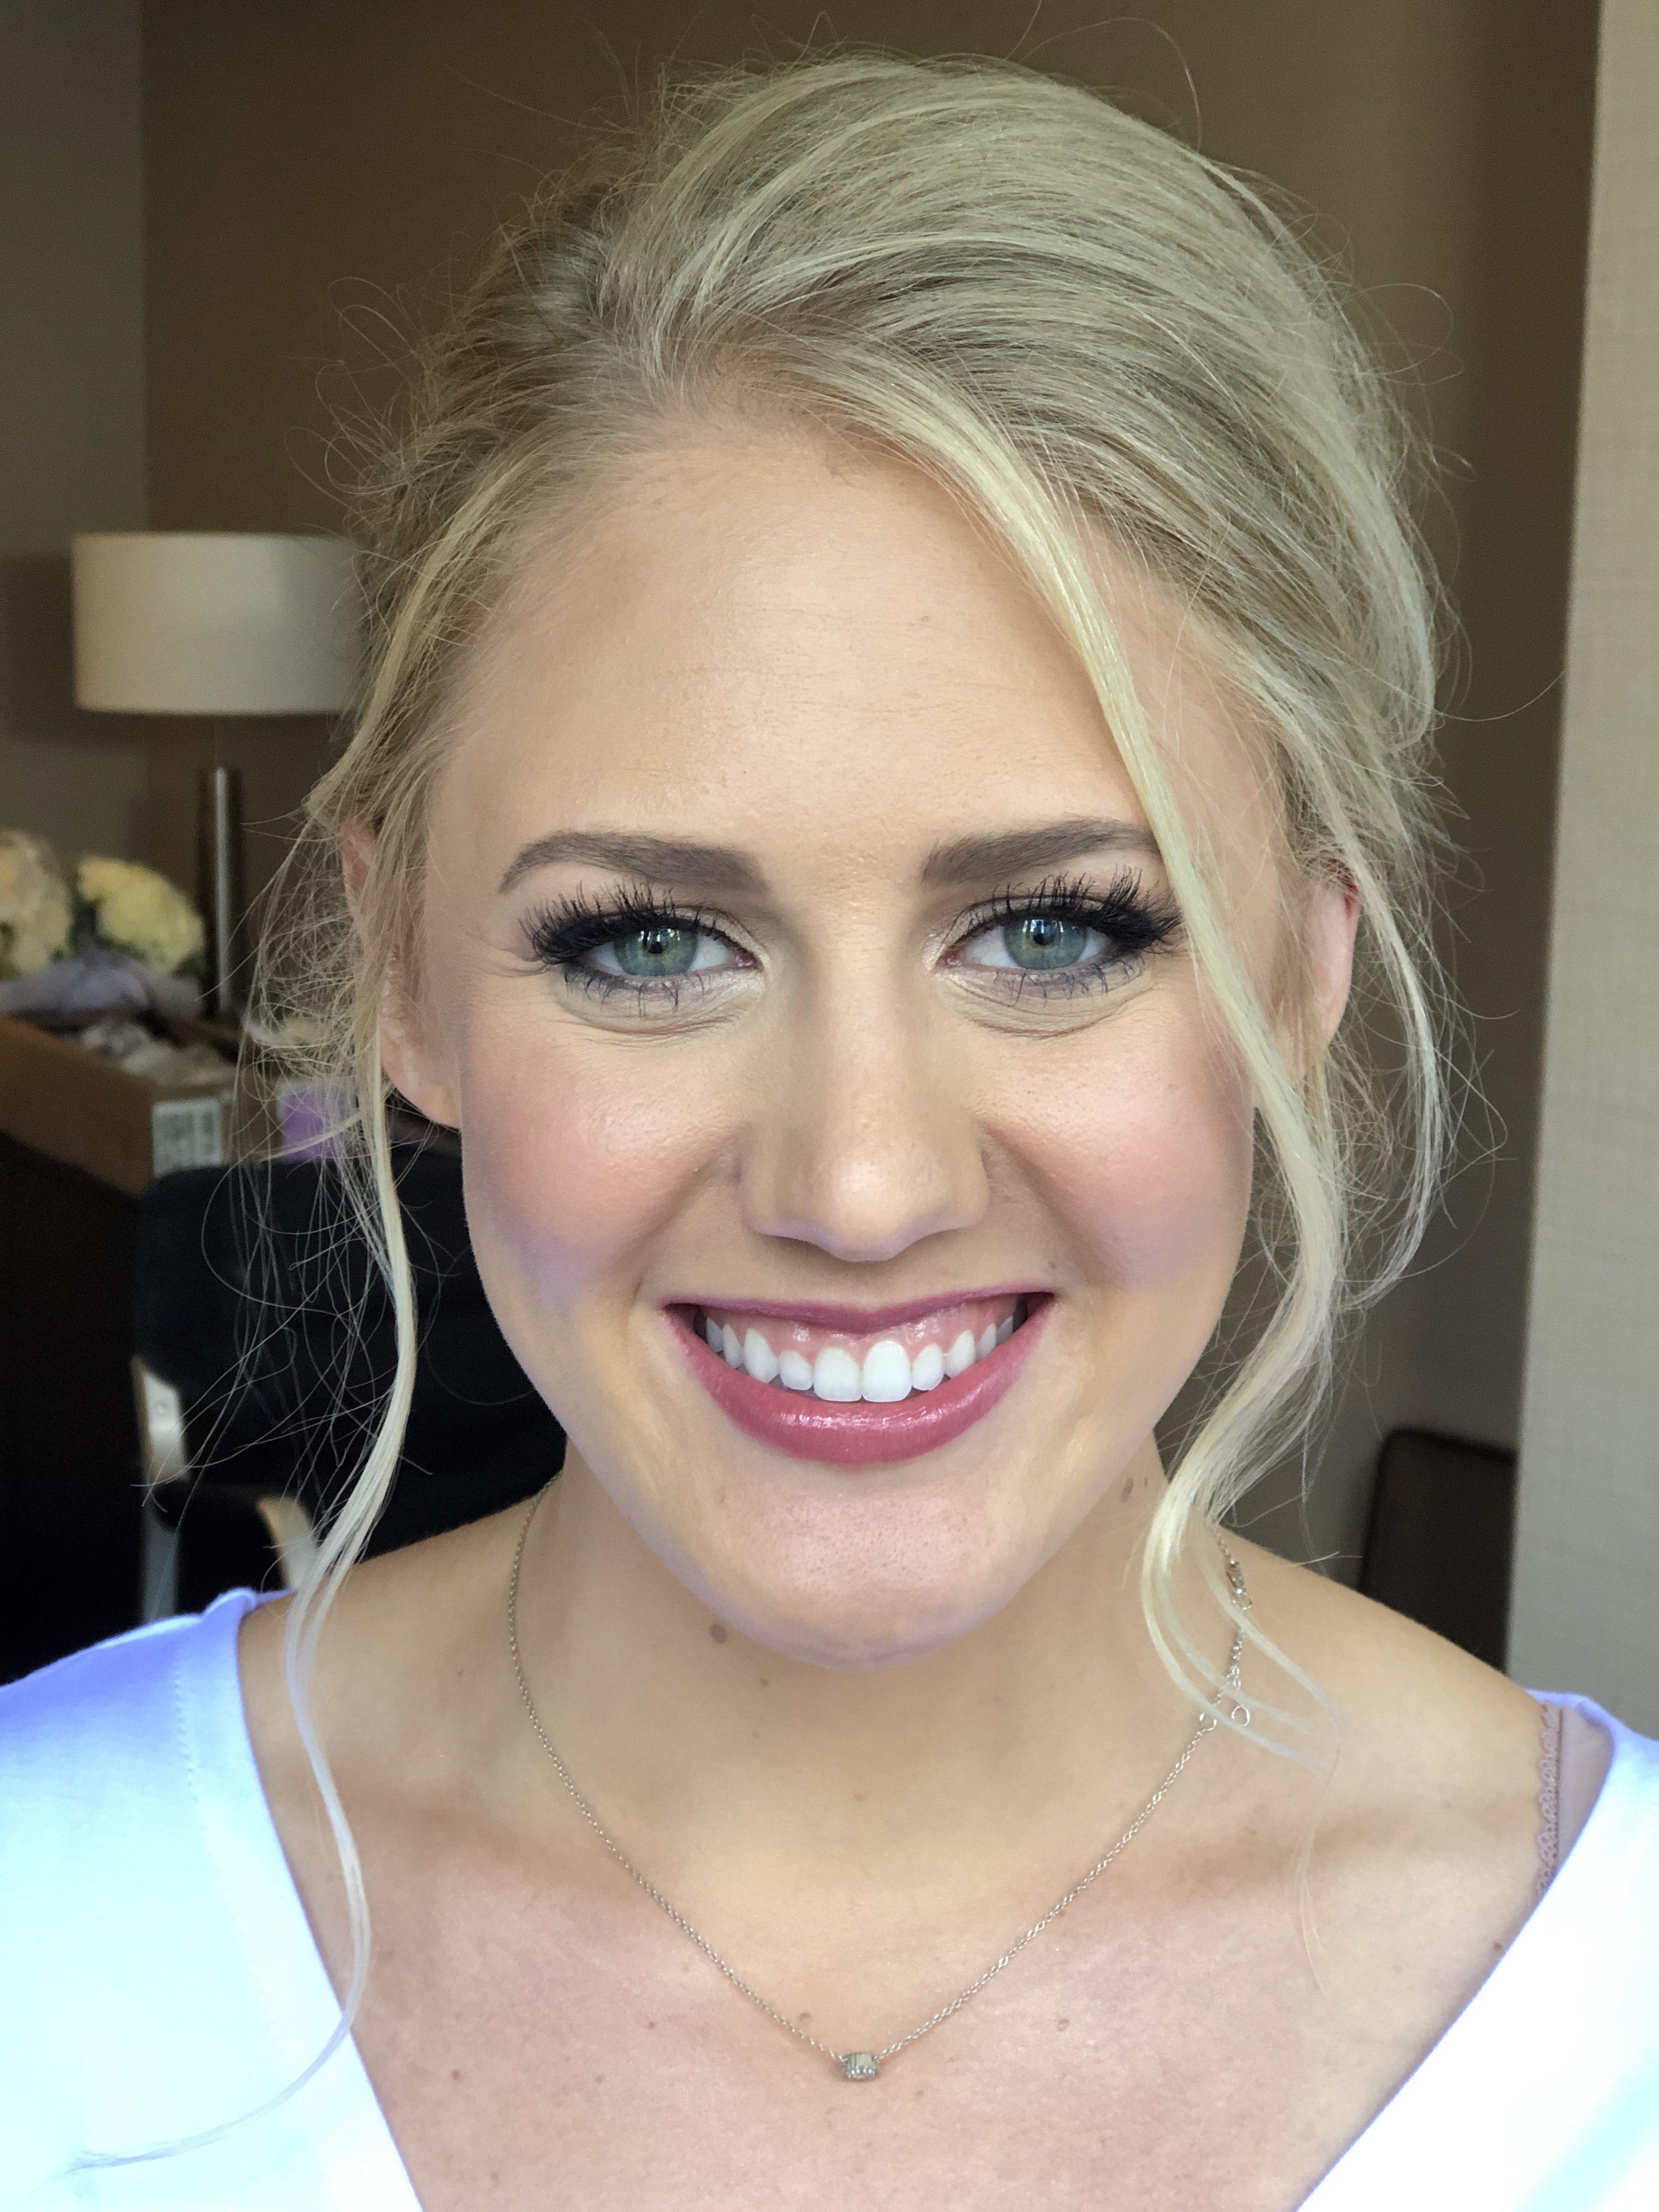 Airbrush makeup Airbrush makeup, Freelance makeup artist